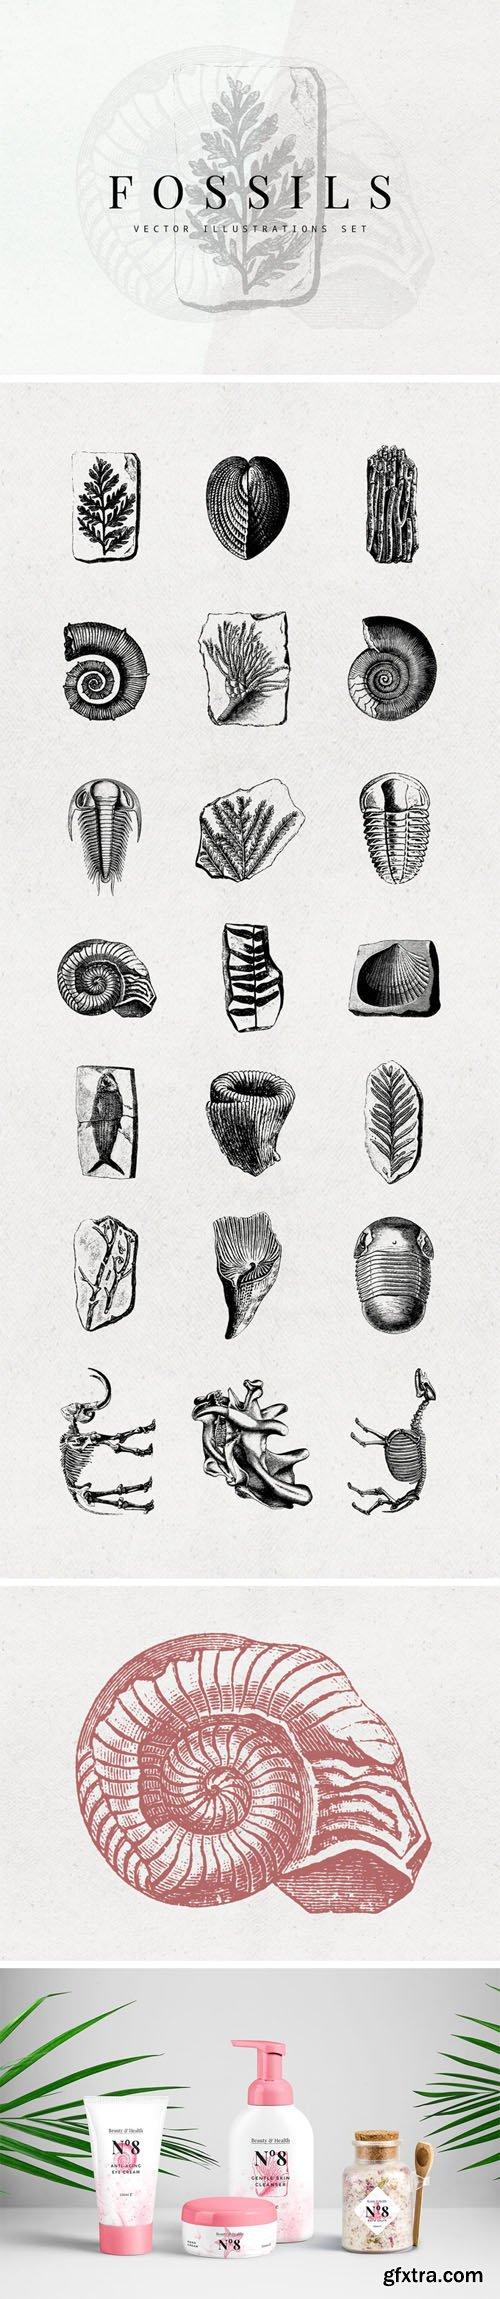 21 Fossils Vector Illustrations Set